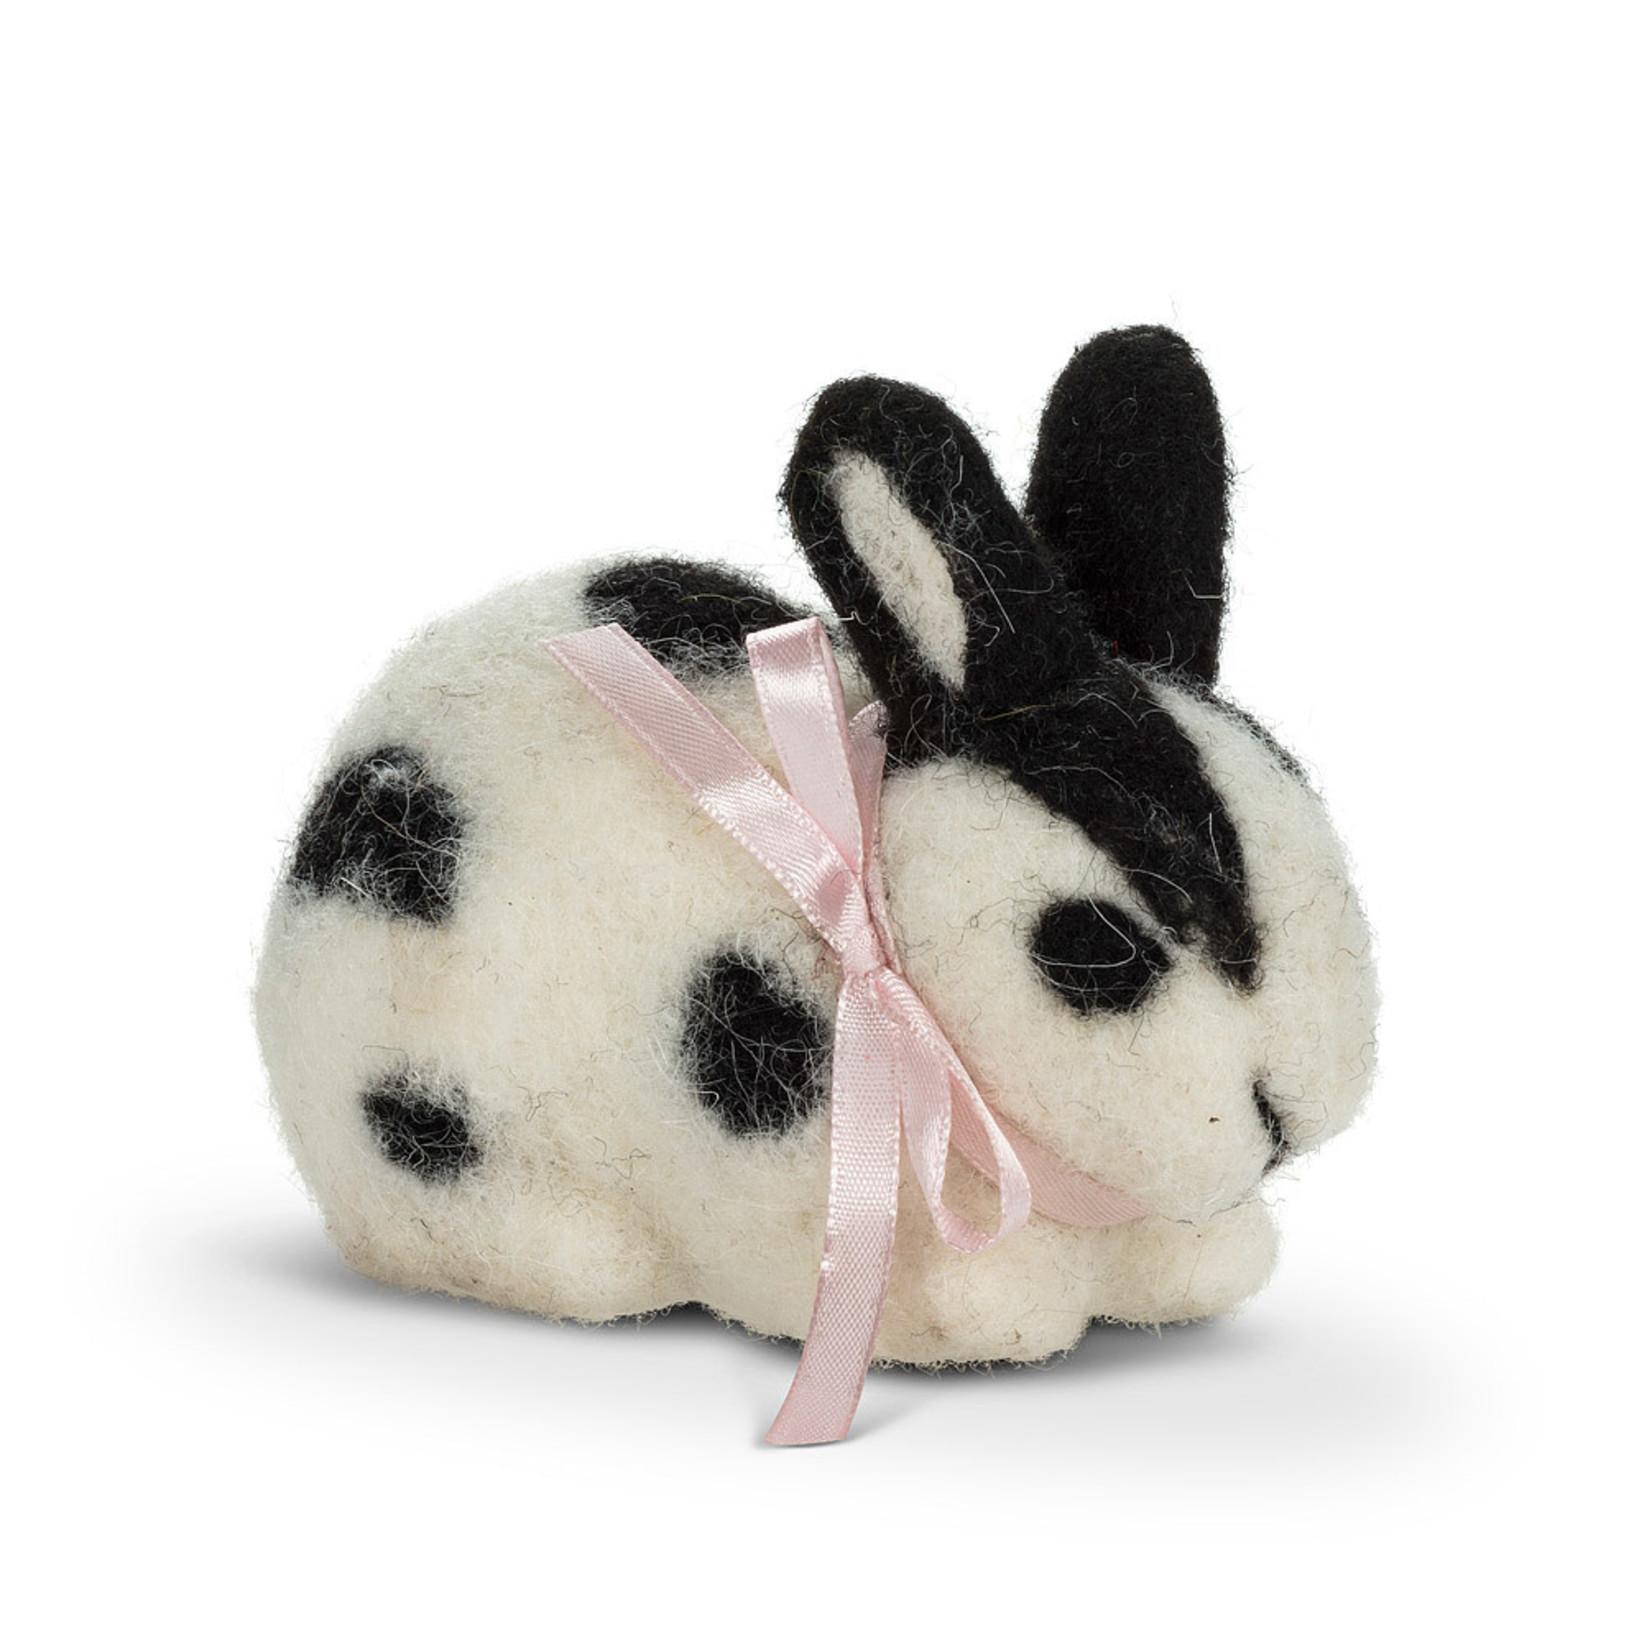 Sm Blk & Wht Sitting Rabbit